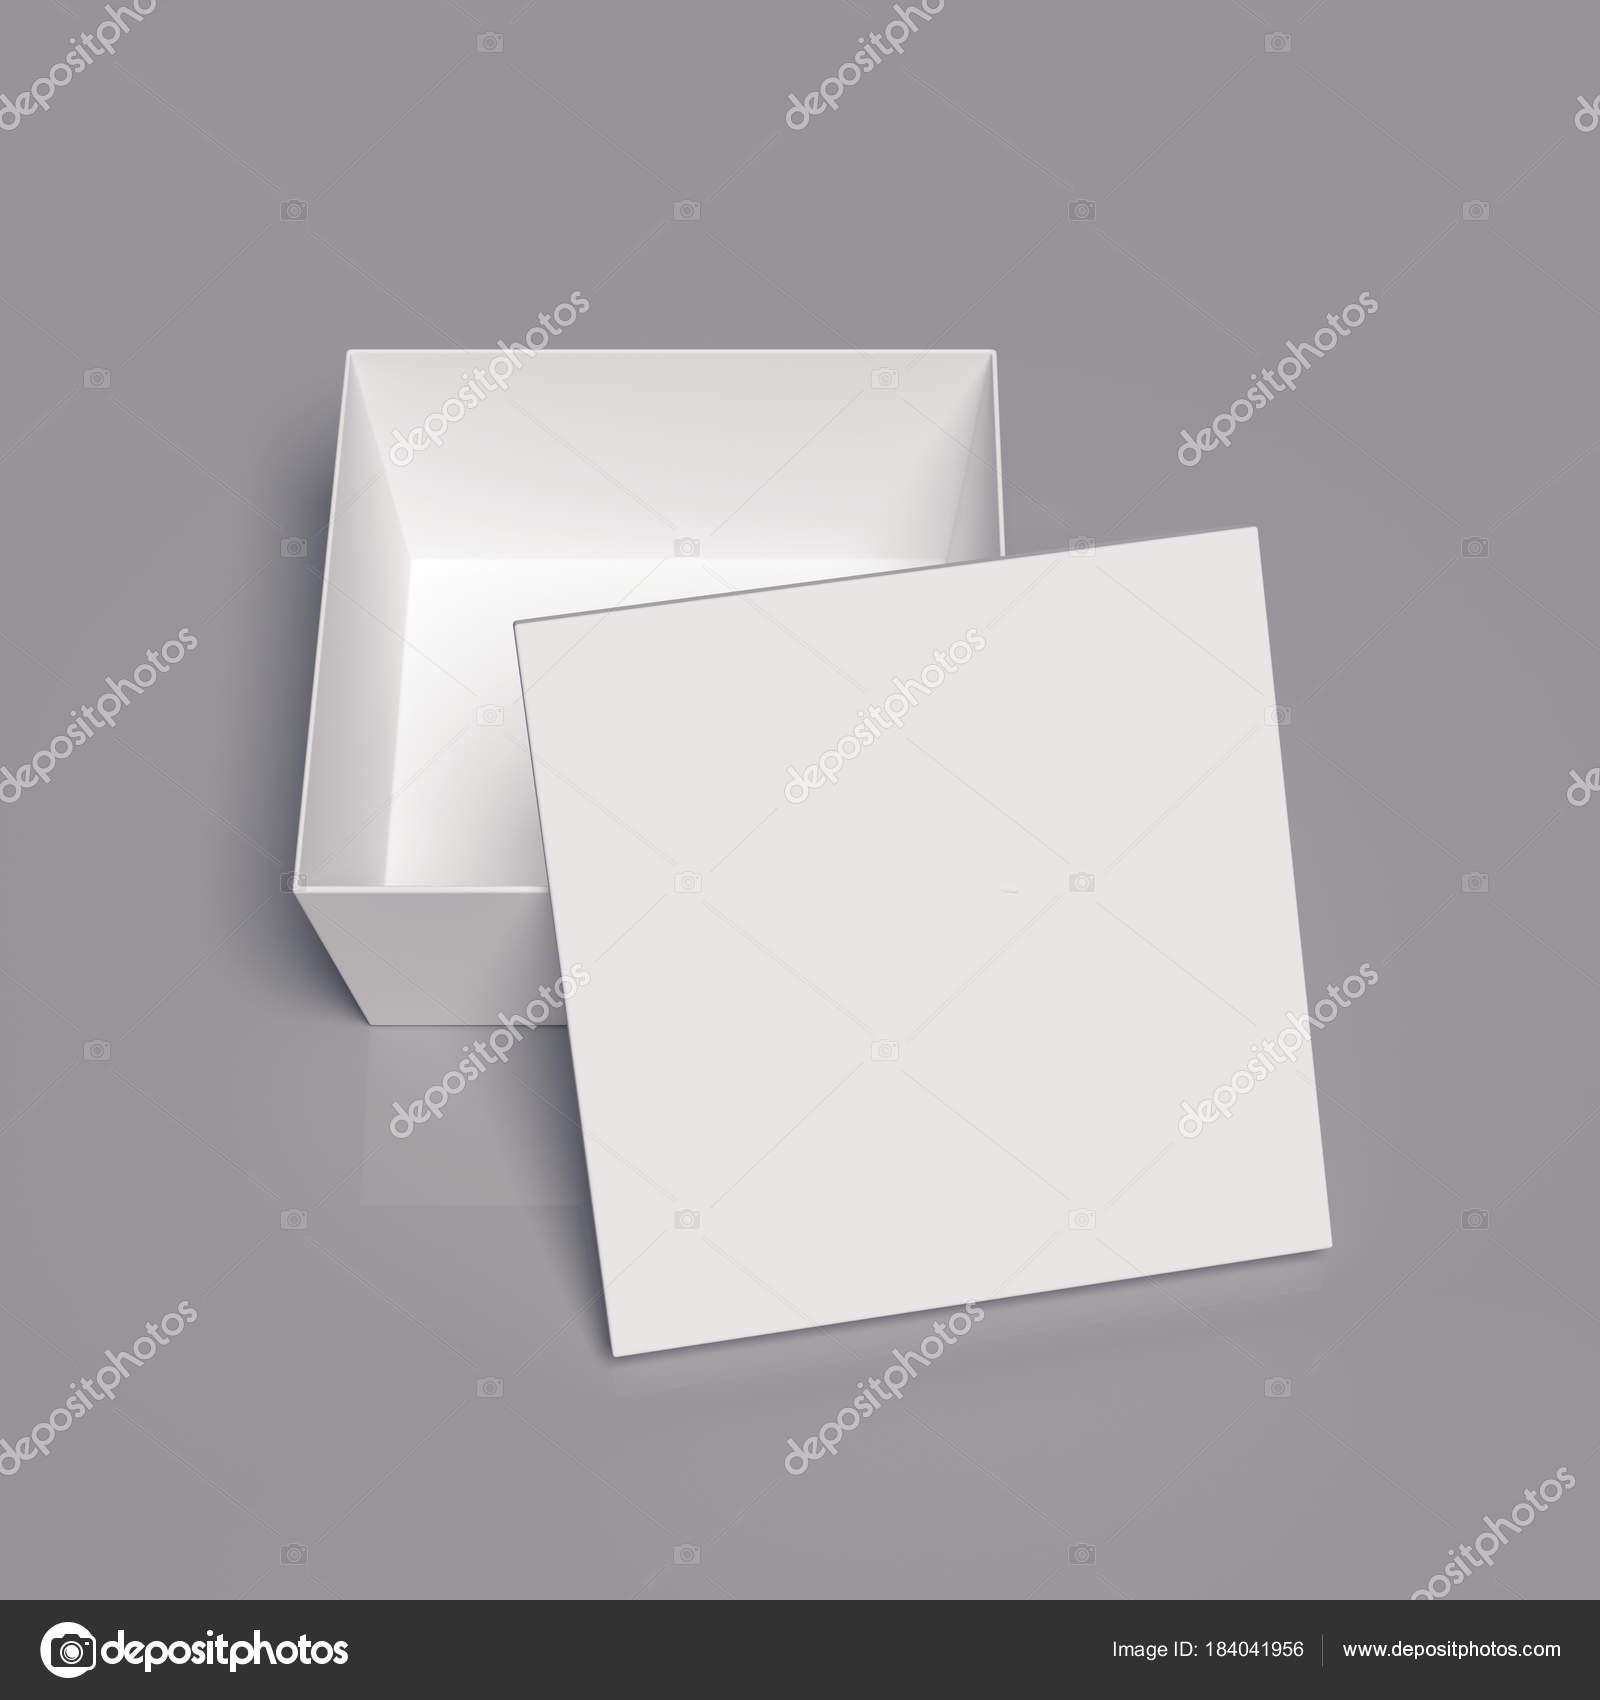 plantilla de caja de cartón — Foto de stock © TissaNsk #184041956